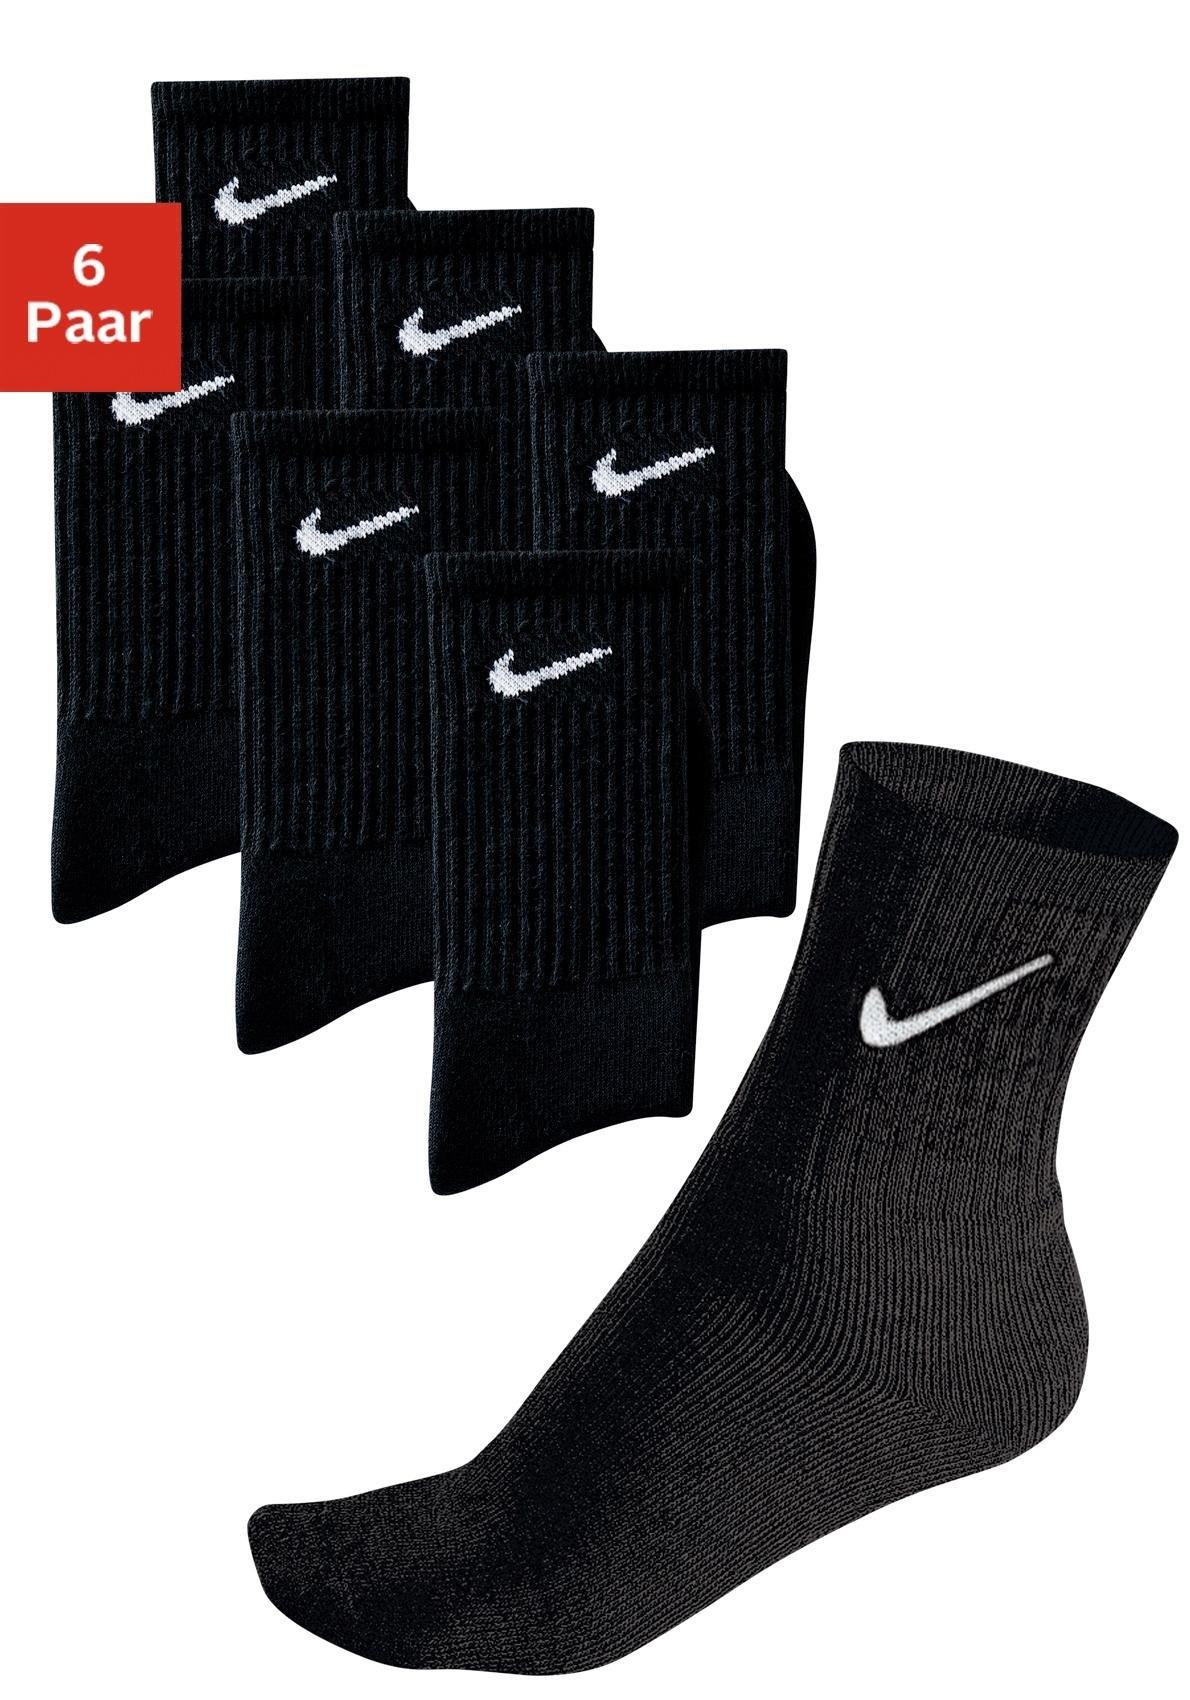 Nike Sportsokken met voetfrotté (6 paar) nu online bestellen